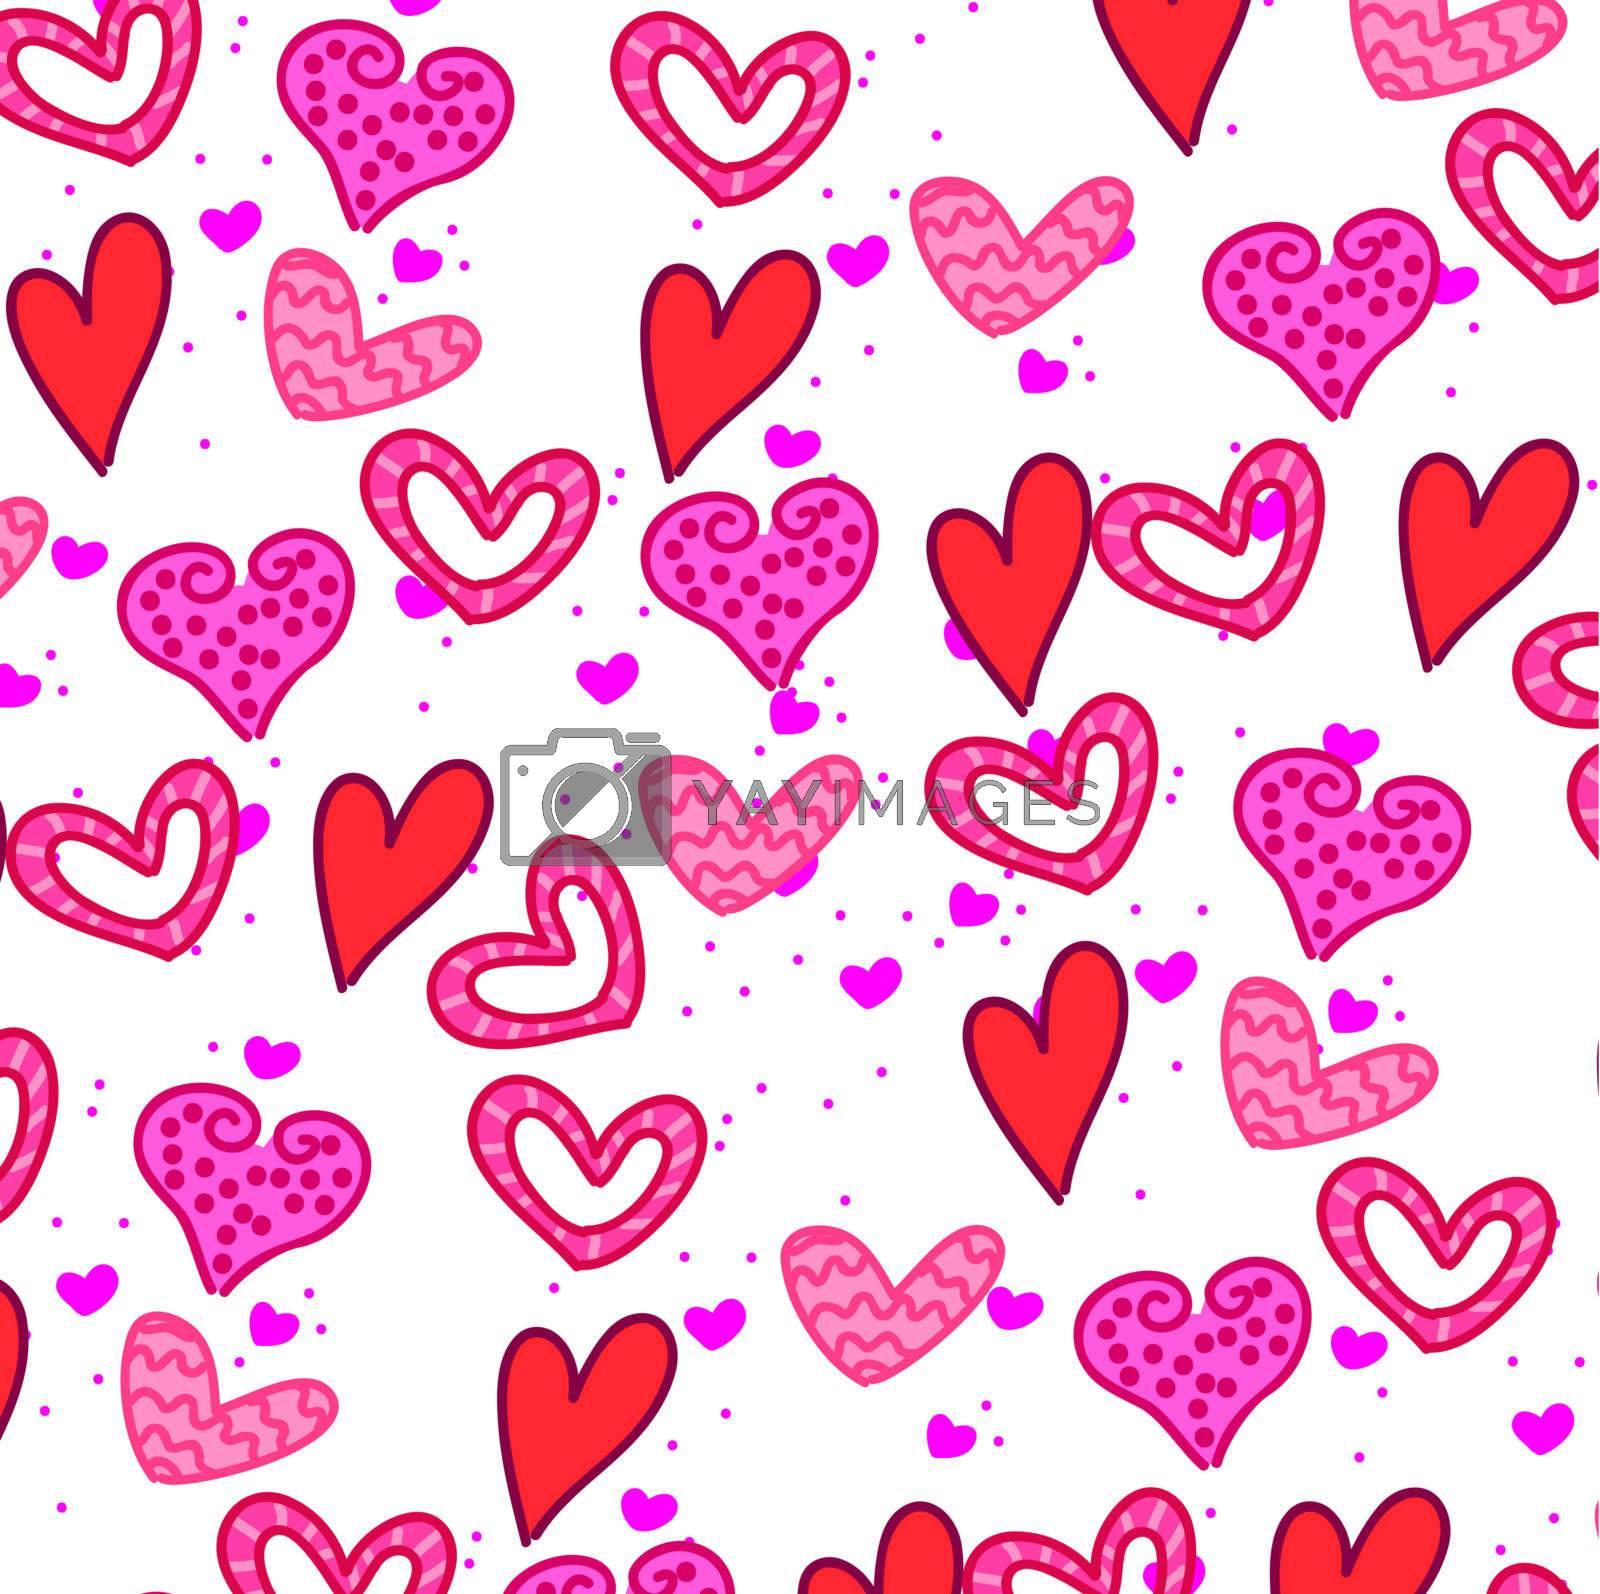 Love card background vector illustration Valentines day